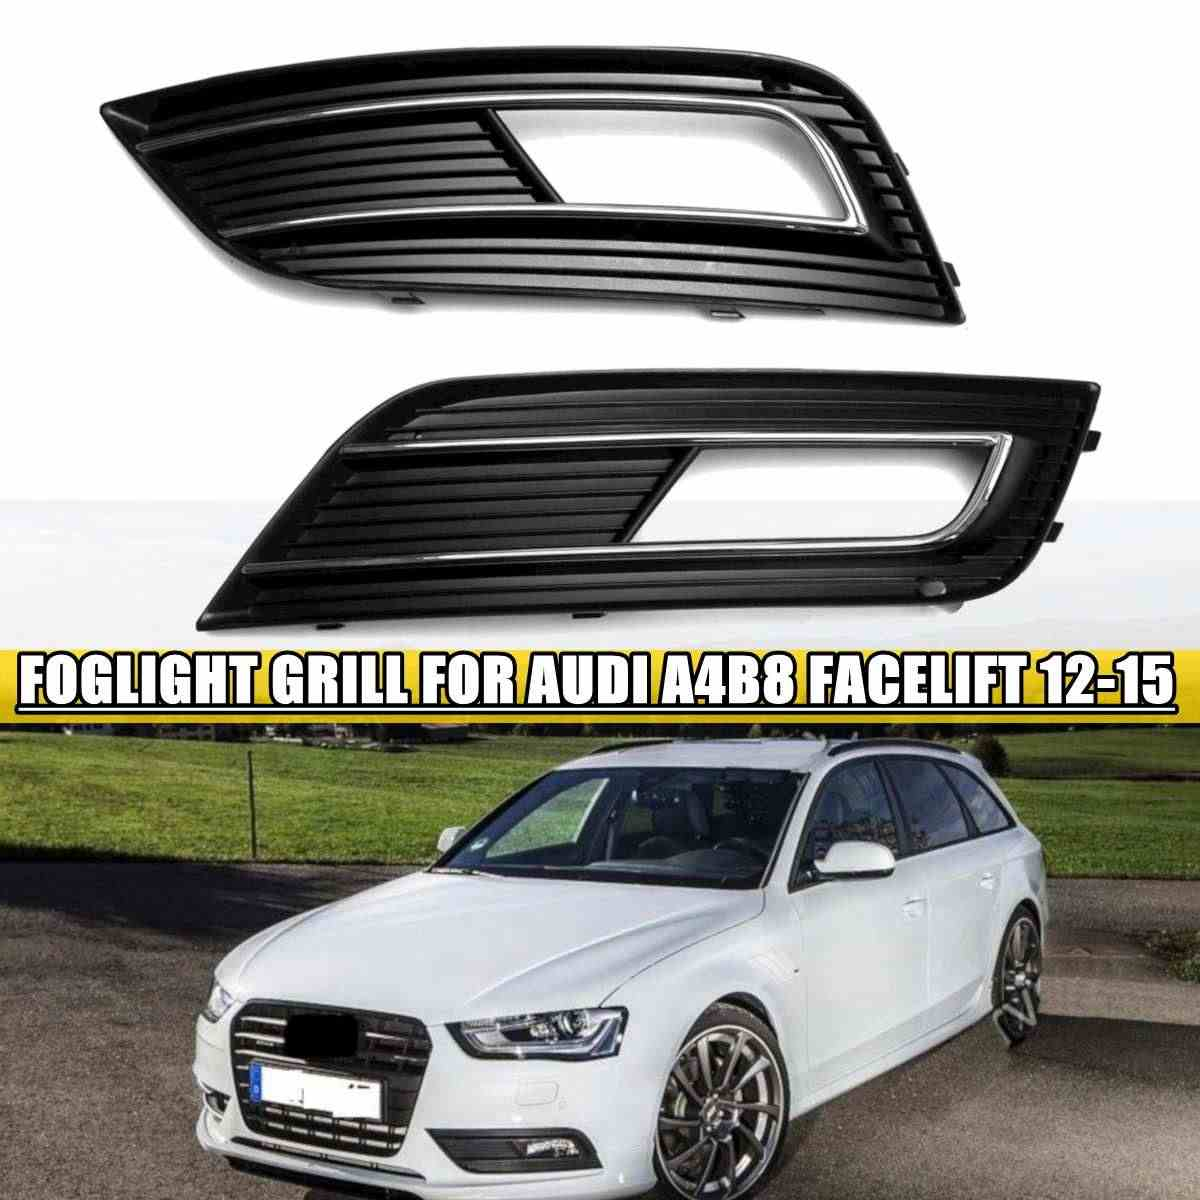 Vehicle Parts & Accessories Motors For Audi A4 B8 Facelift Grille ...